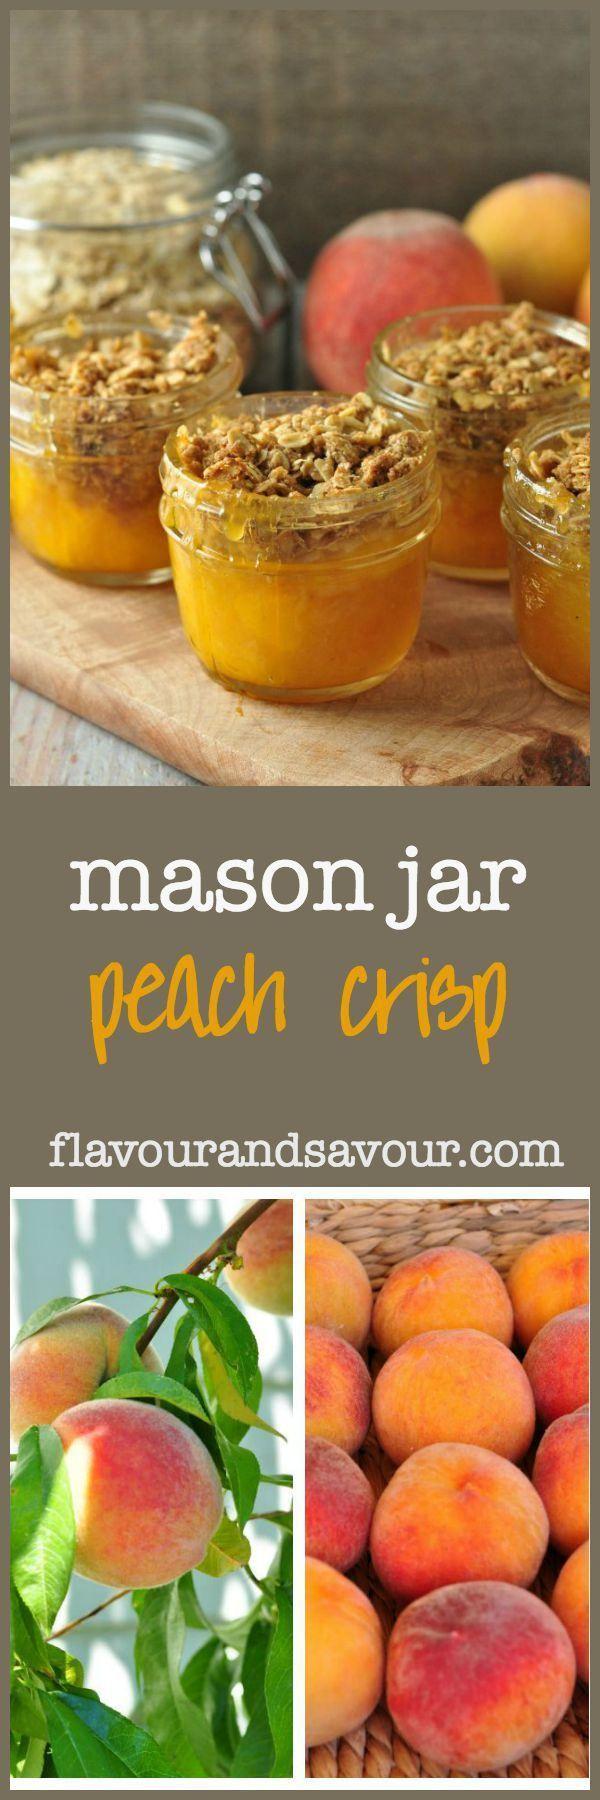 Mason Jar Peach Crisp. Naturally sweet peaches and a crunchy gluten-free topping.